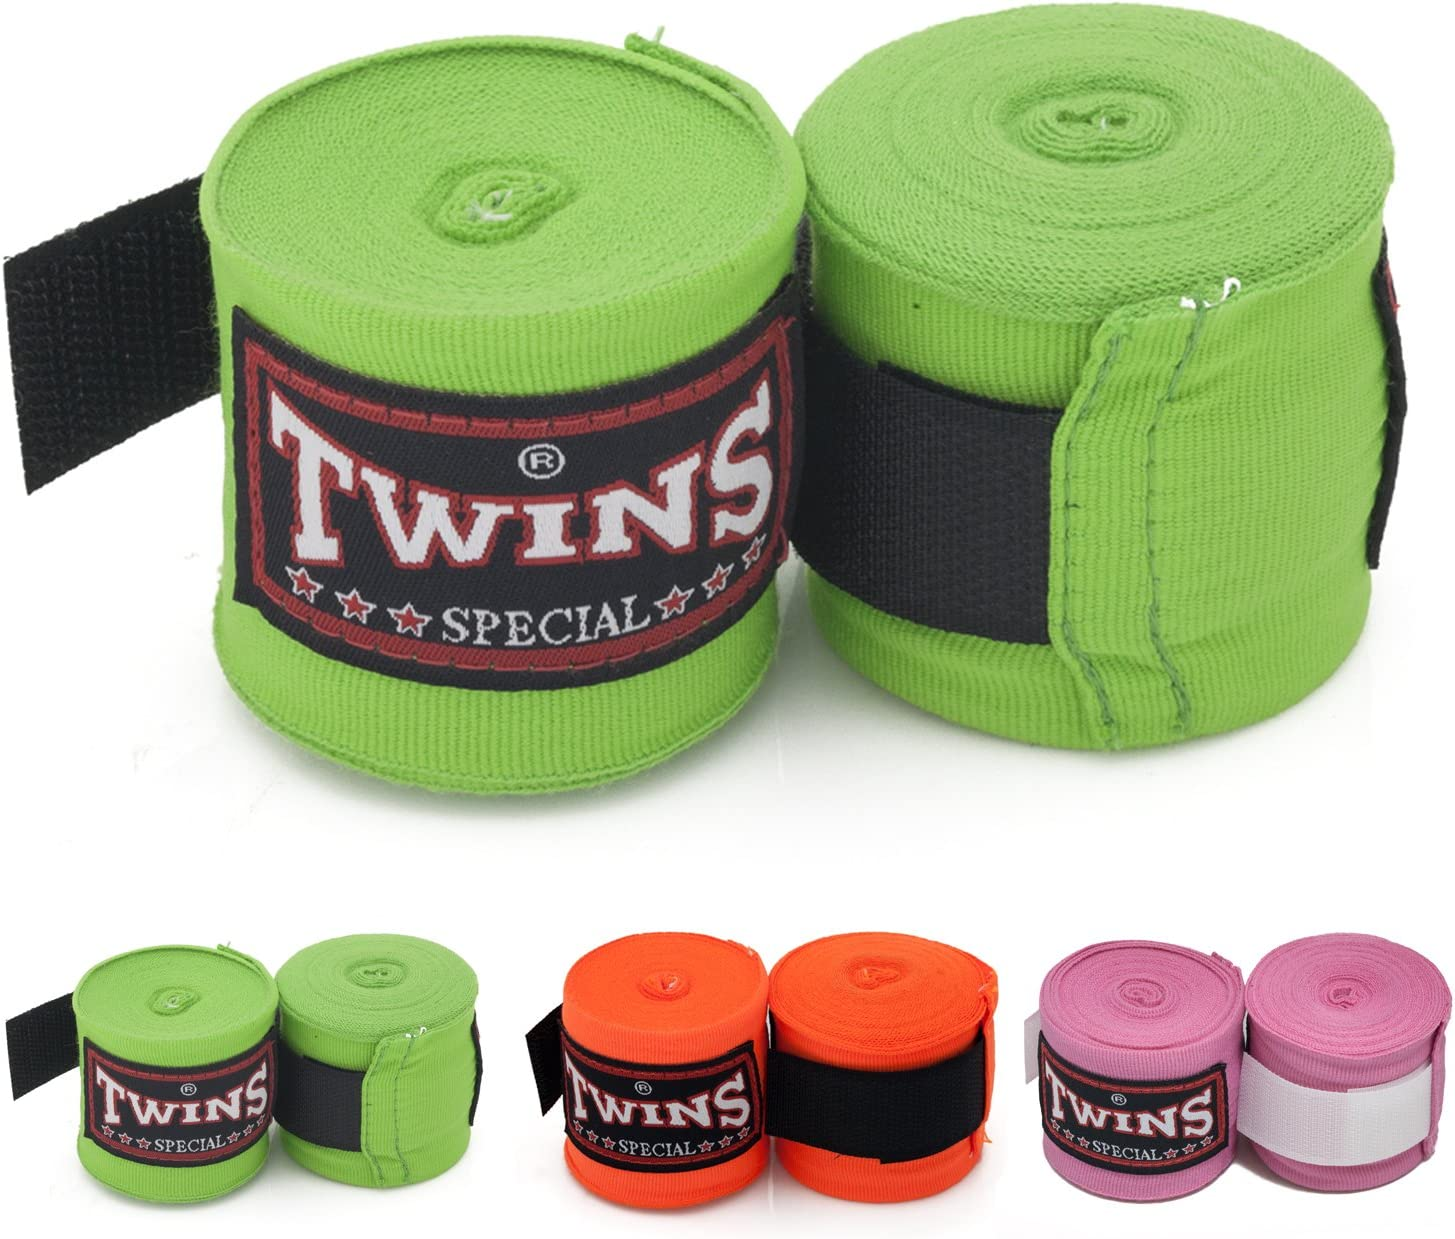 Twins Special CH-5 Bandages ELASTIC COTTON Martial Arts KICK BOXING HANDWRAPS